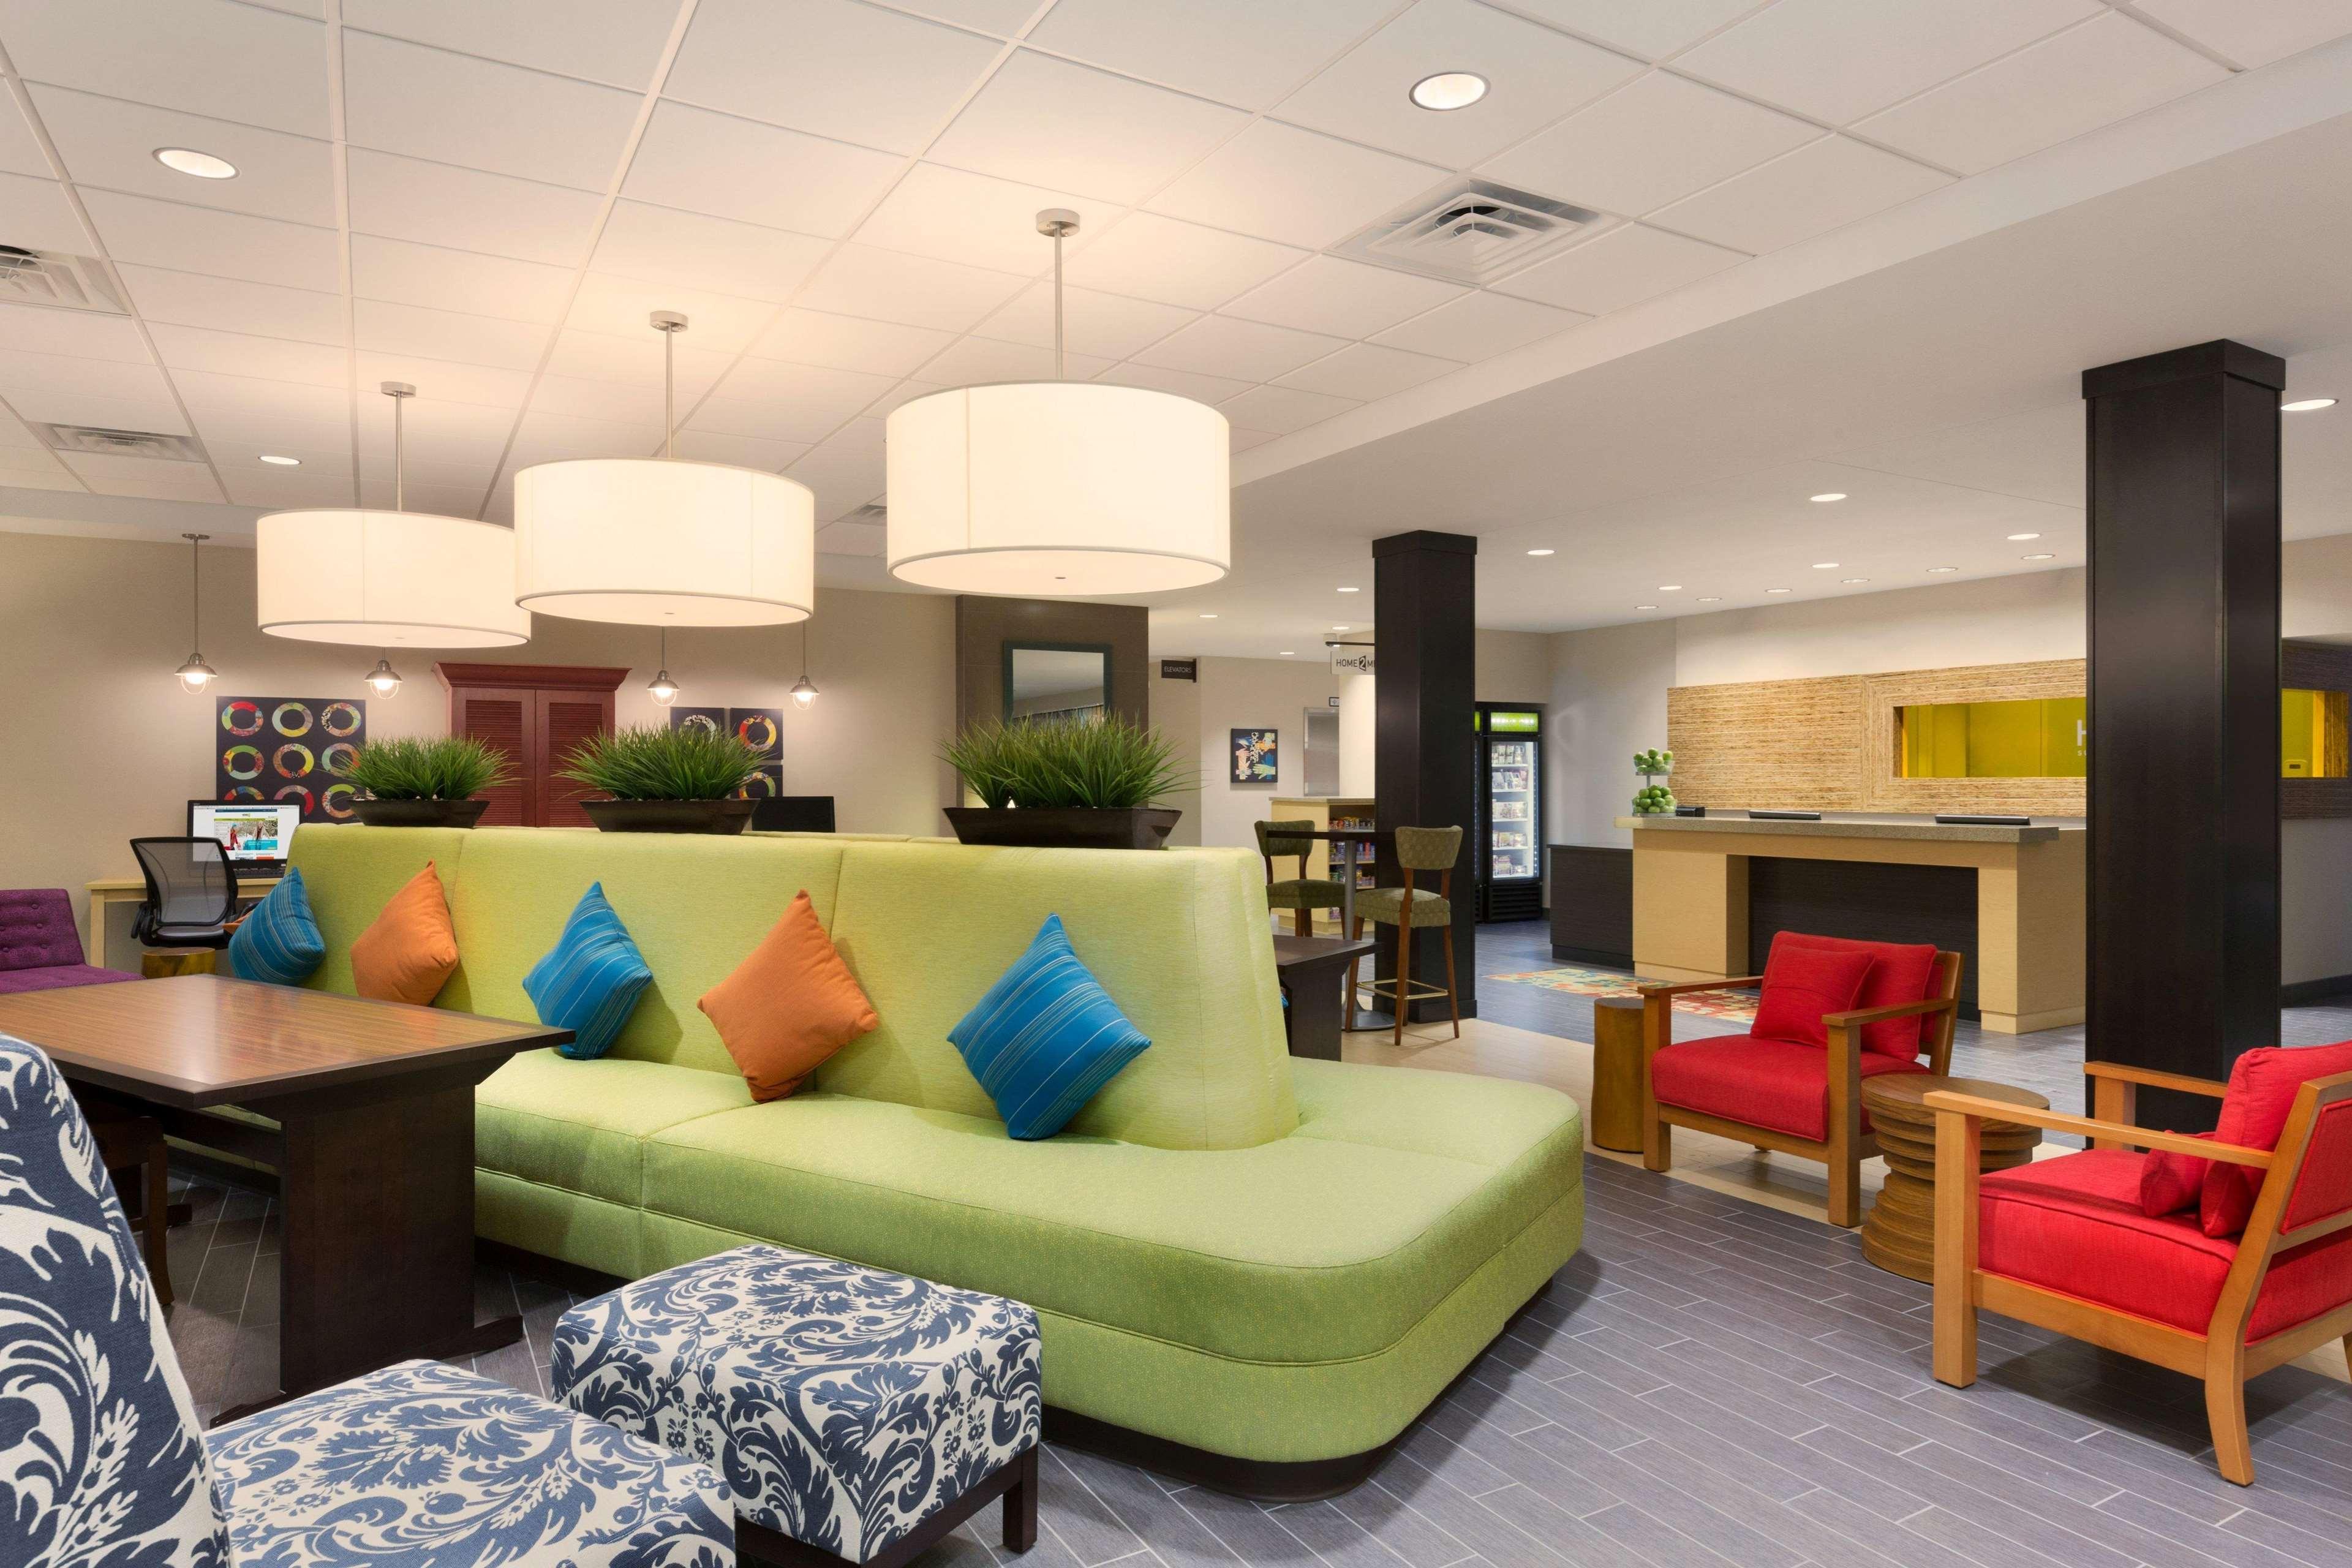 Hotels Near Sanford Medical Center Sioux Falls Sd